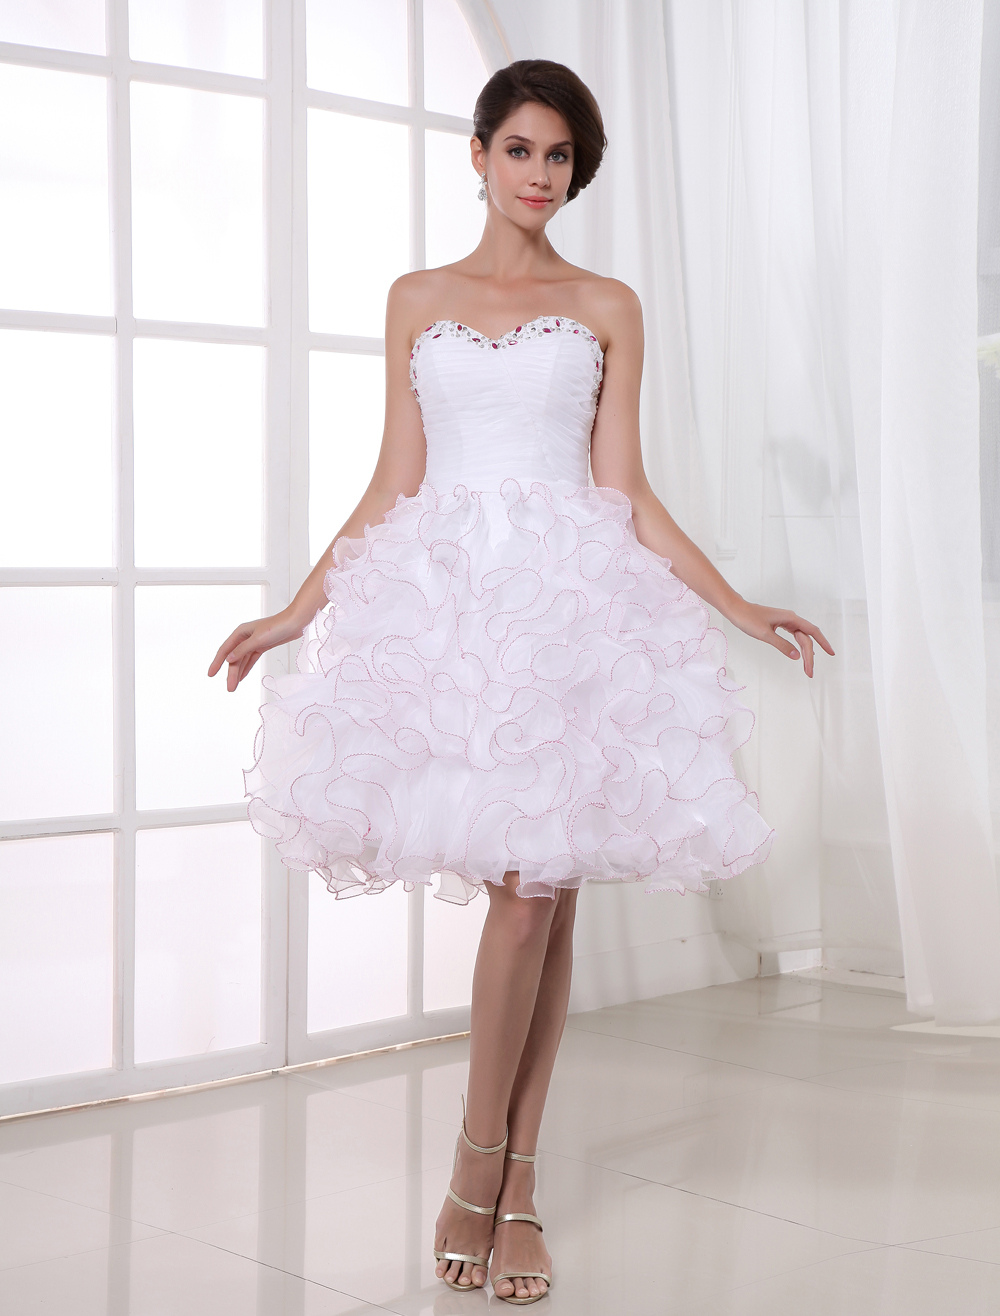 A-line White Organza Ruffles Knee-Length Women's Prom Dress